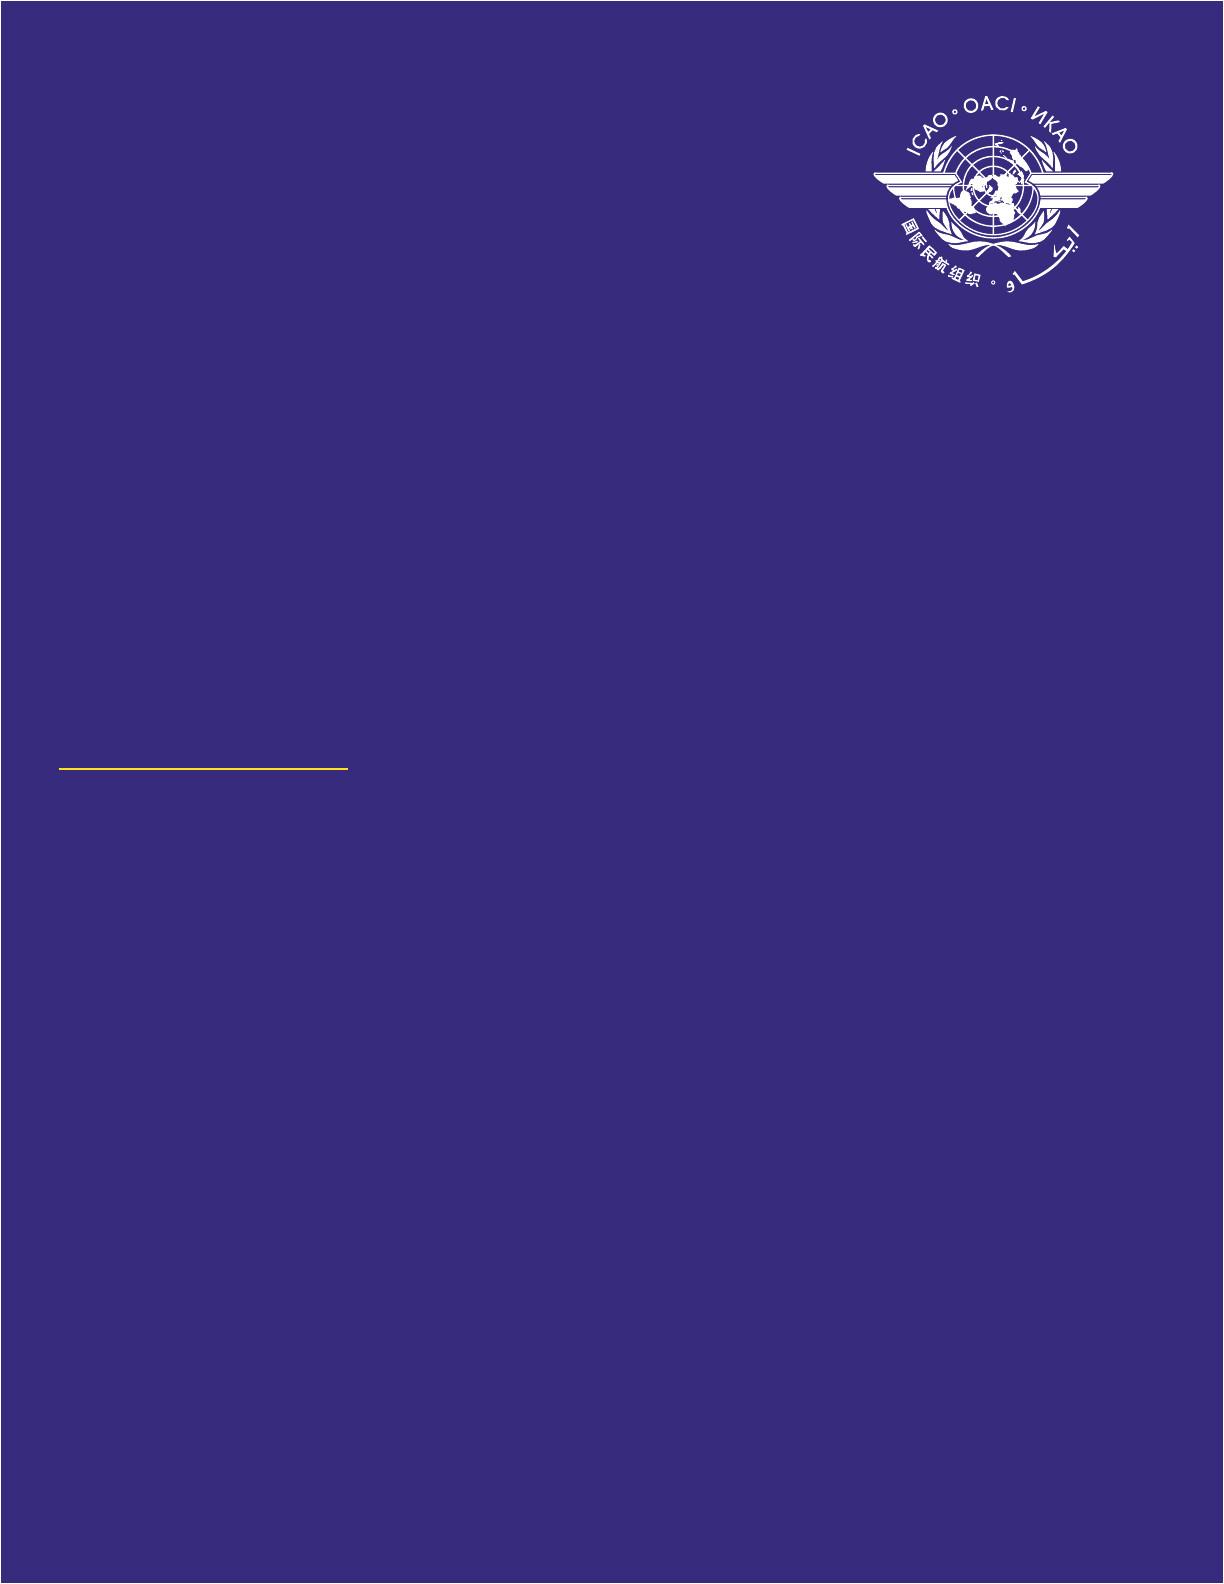 Machine Readable Zone Border Crossing Card Part 1 Machine Readable Passports Vol 2